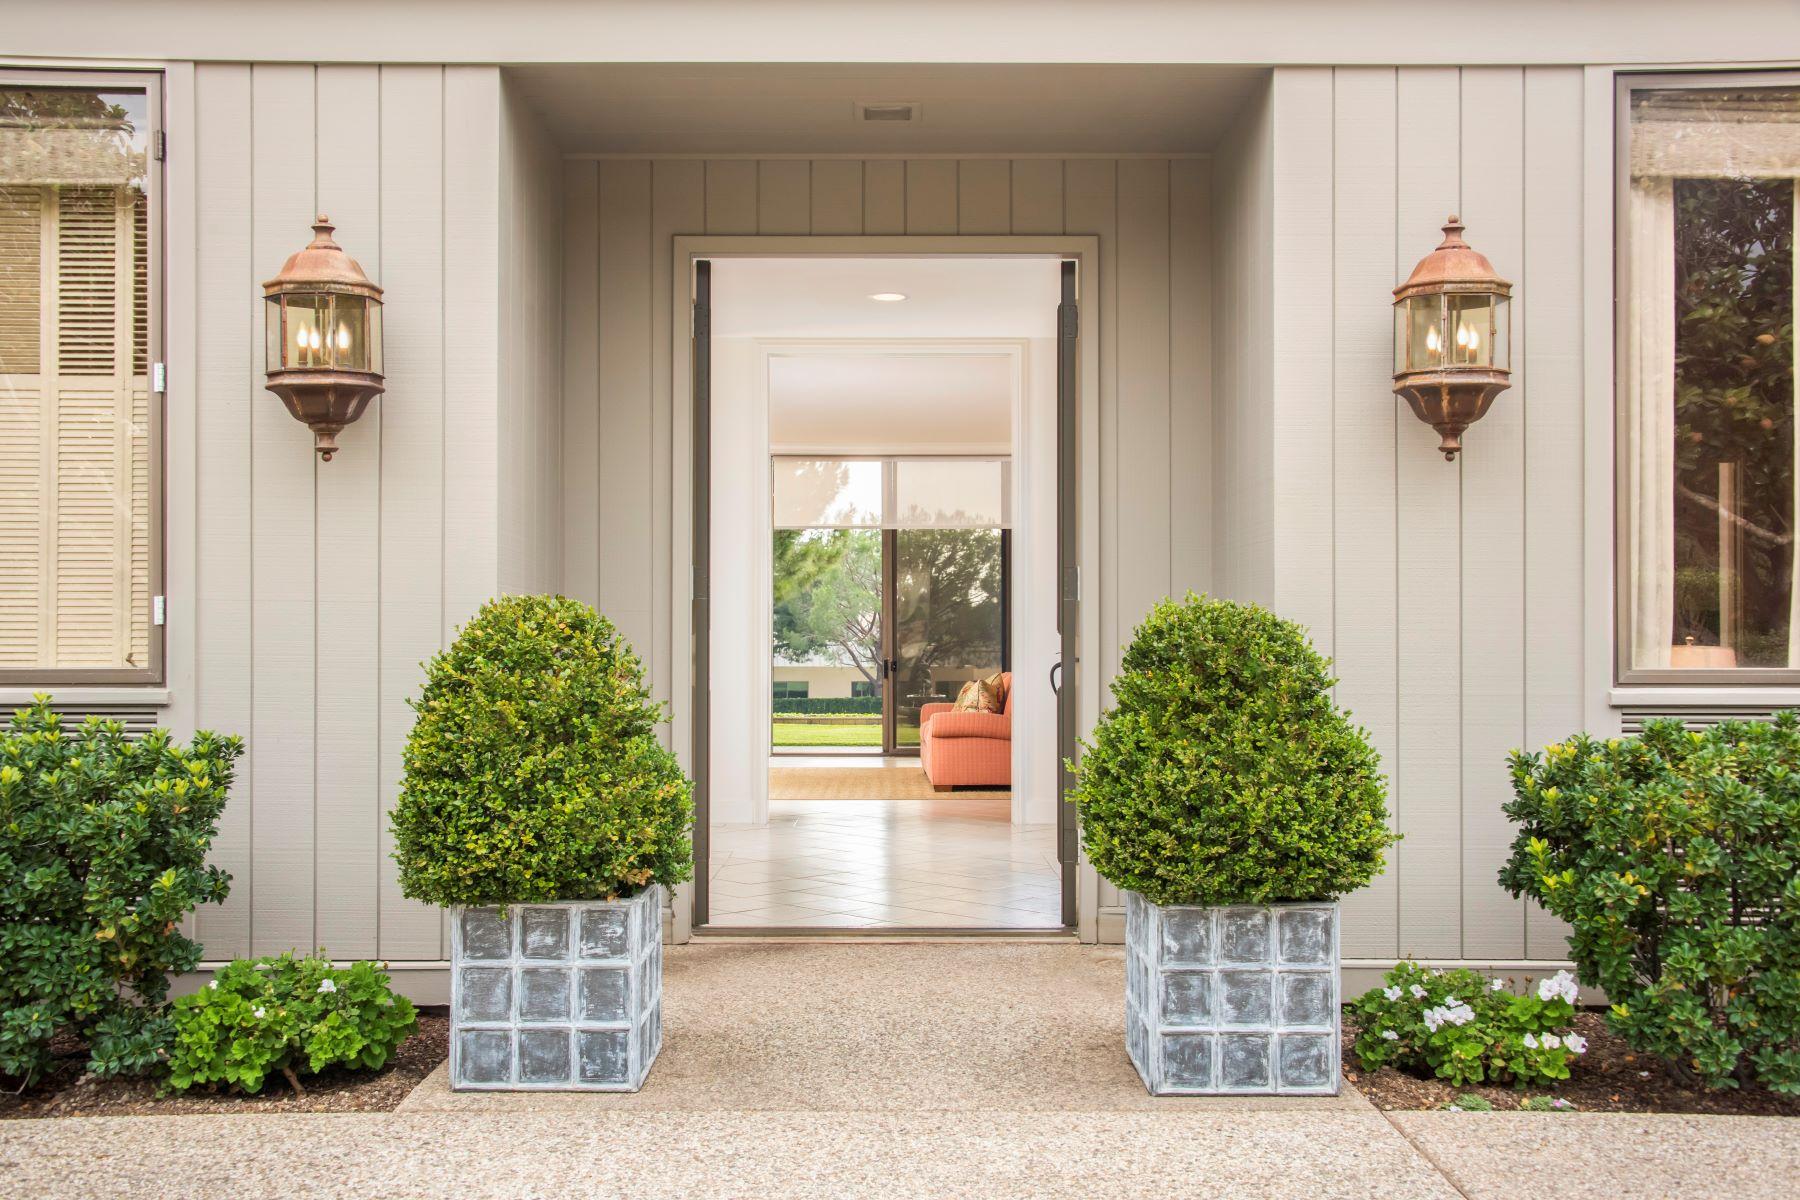 Property for Sale at Birnam Wood Home in Prime Location! 2079 Birnam Wood Drive Santa Barbara, California 93108 United States